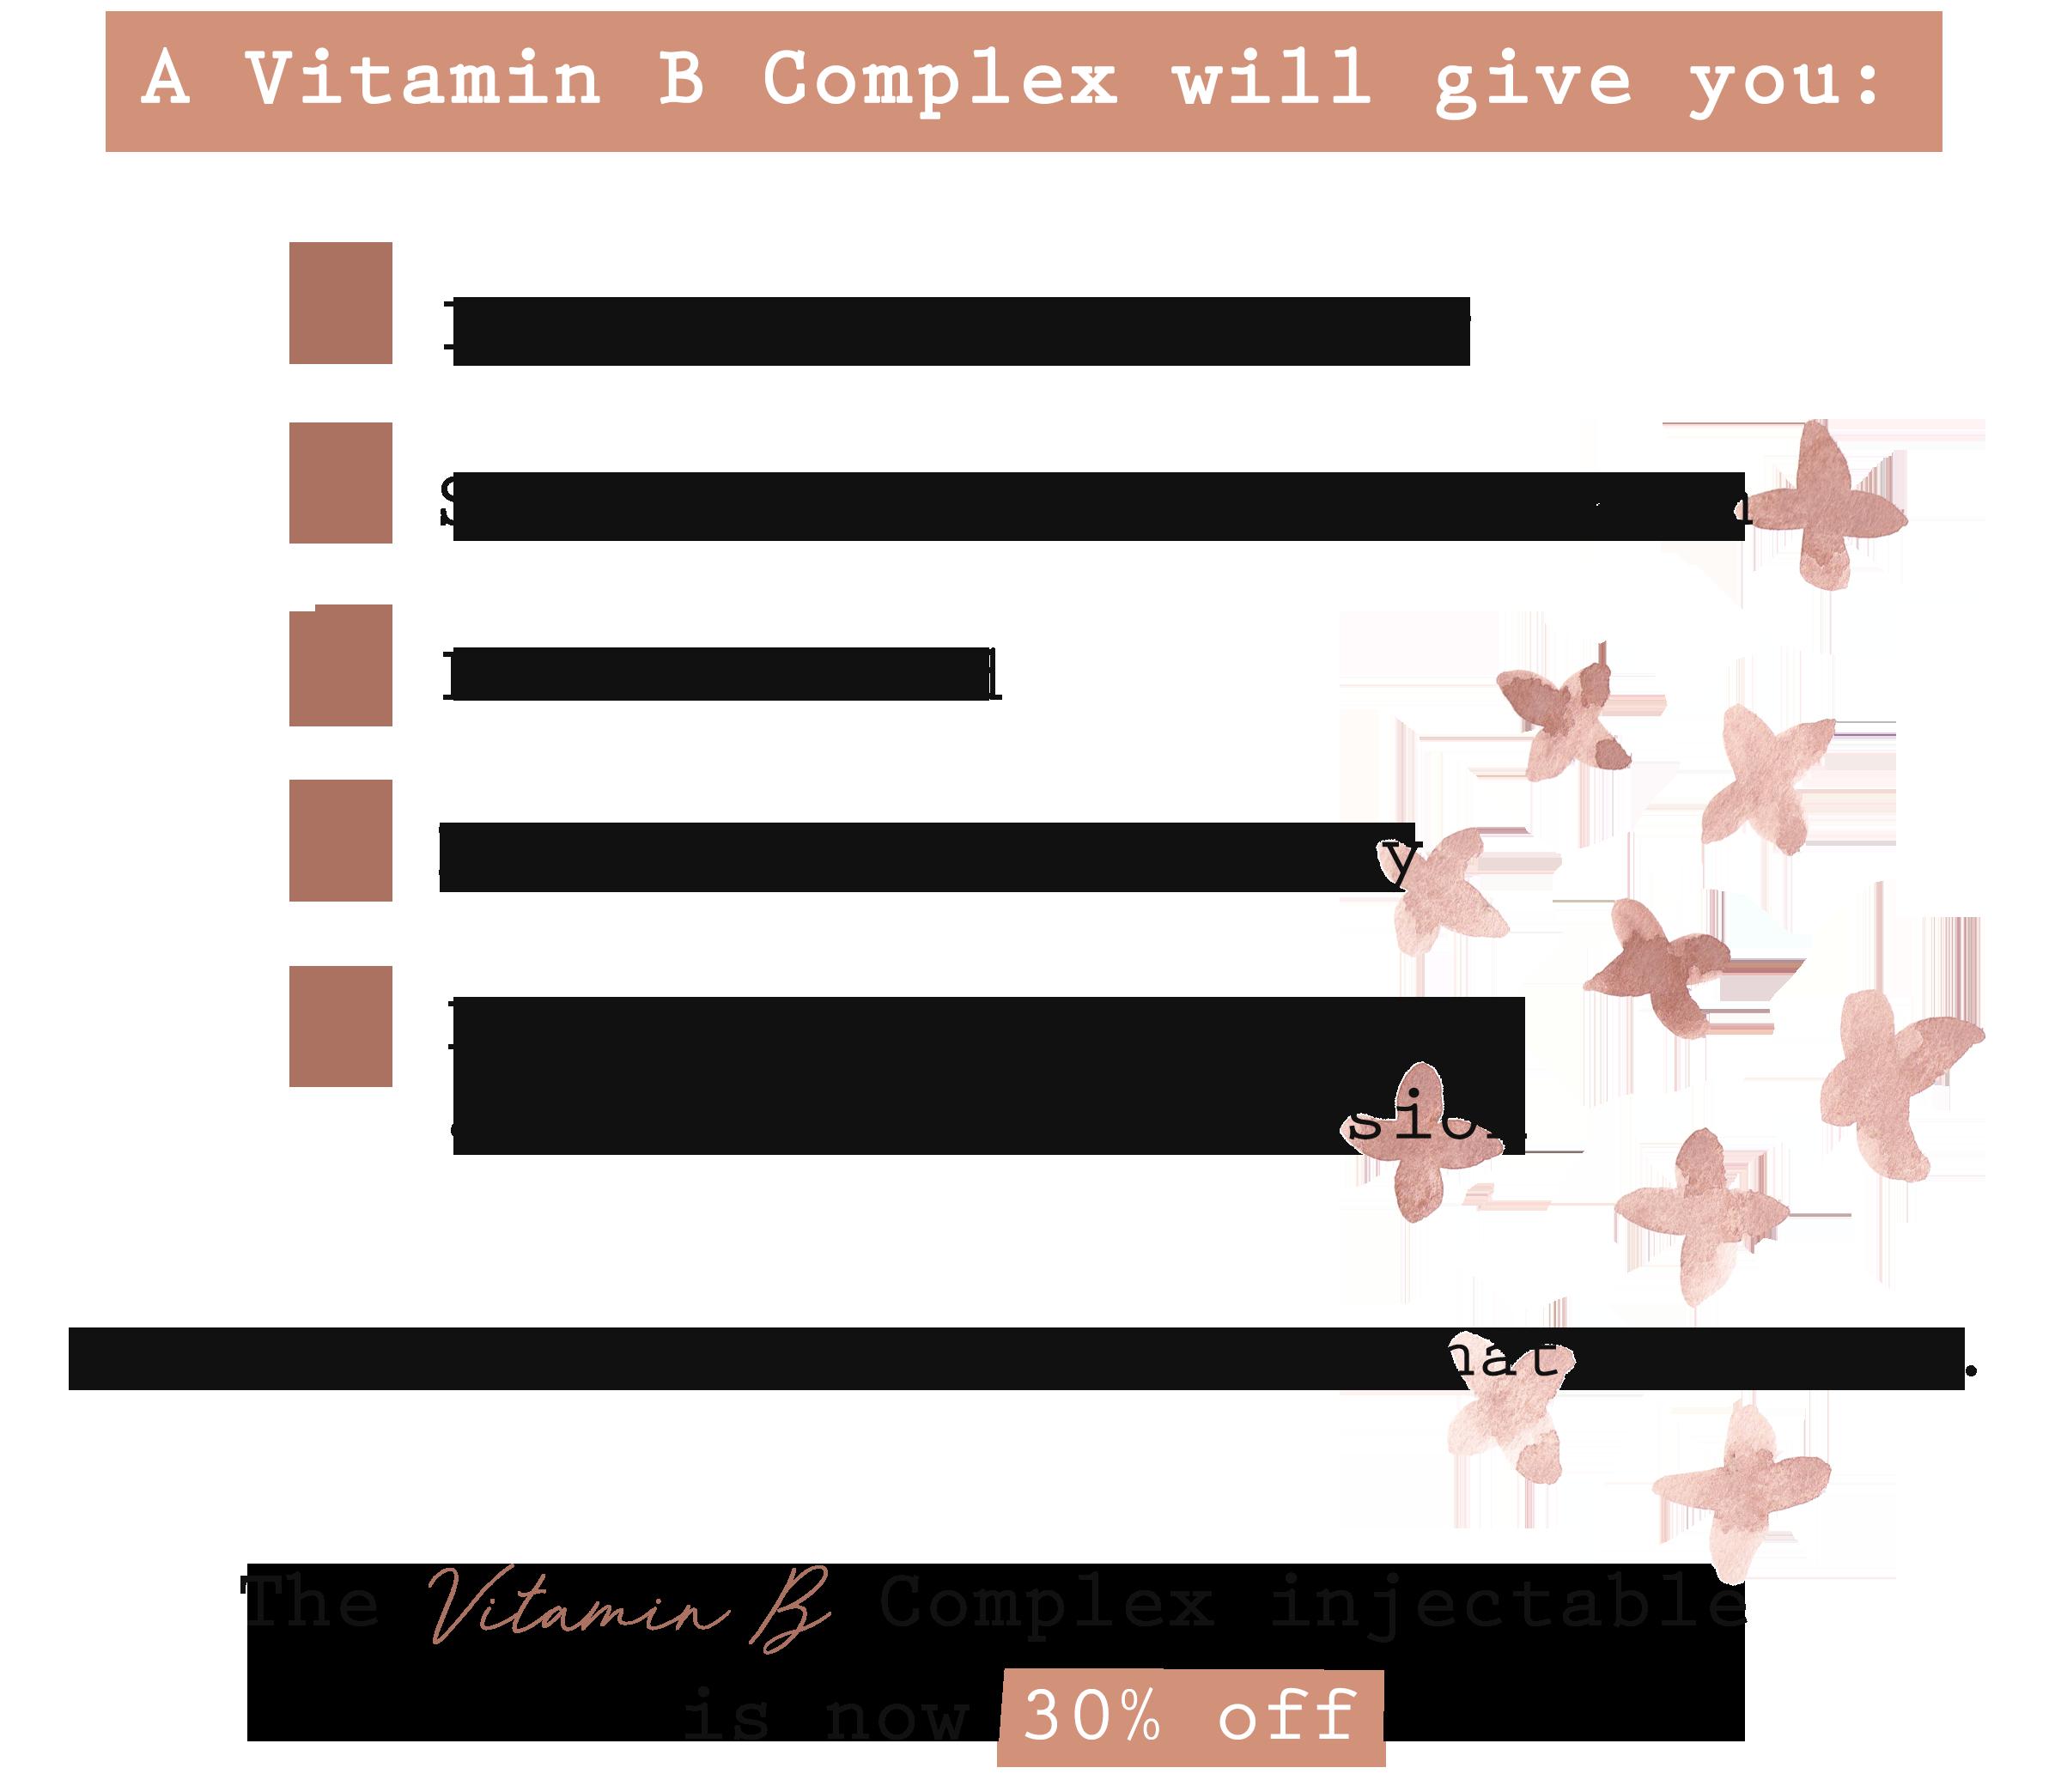 V2-SS-Blog-Vitamin-B-3.png